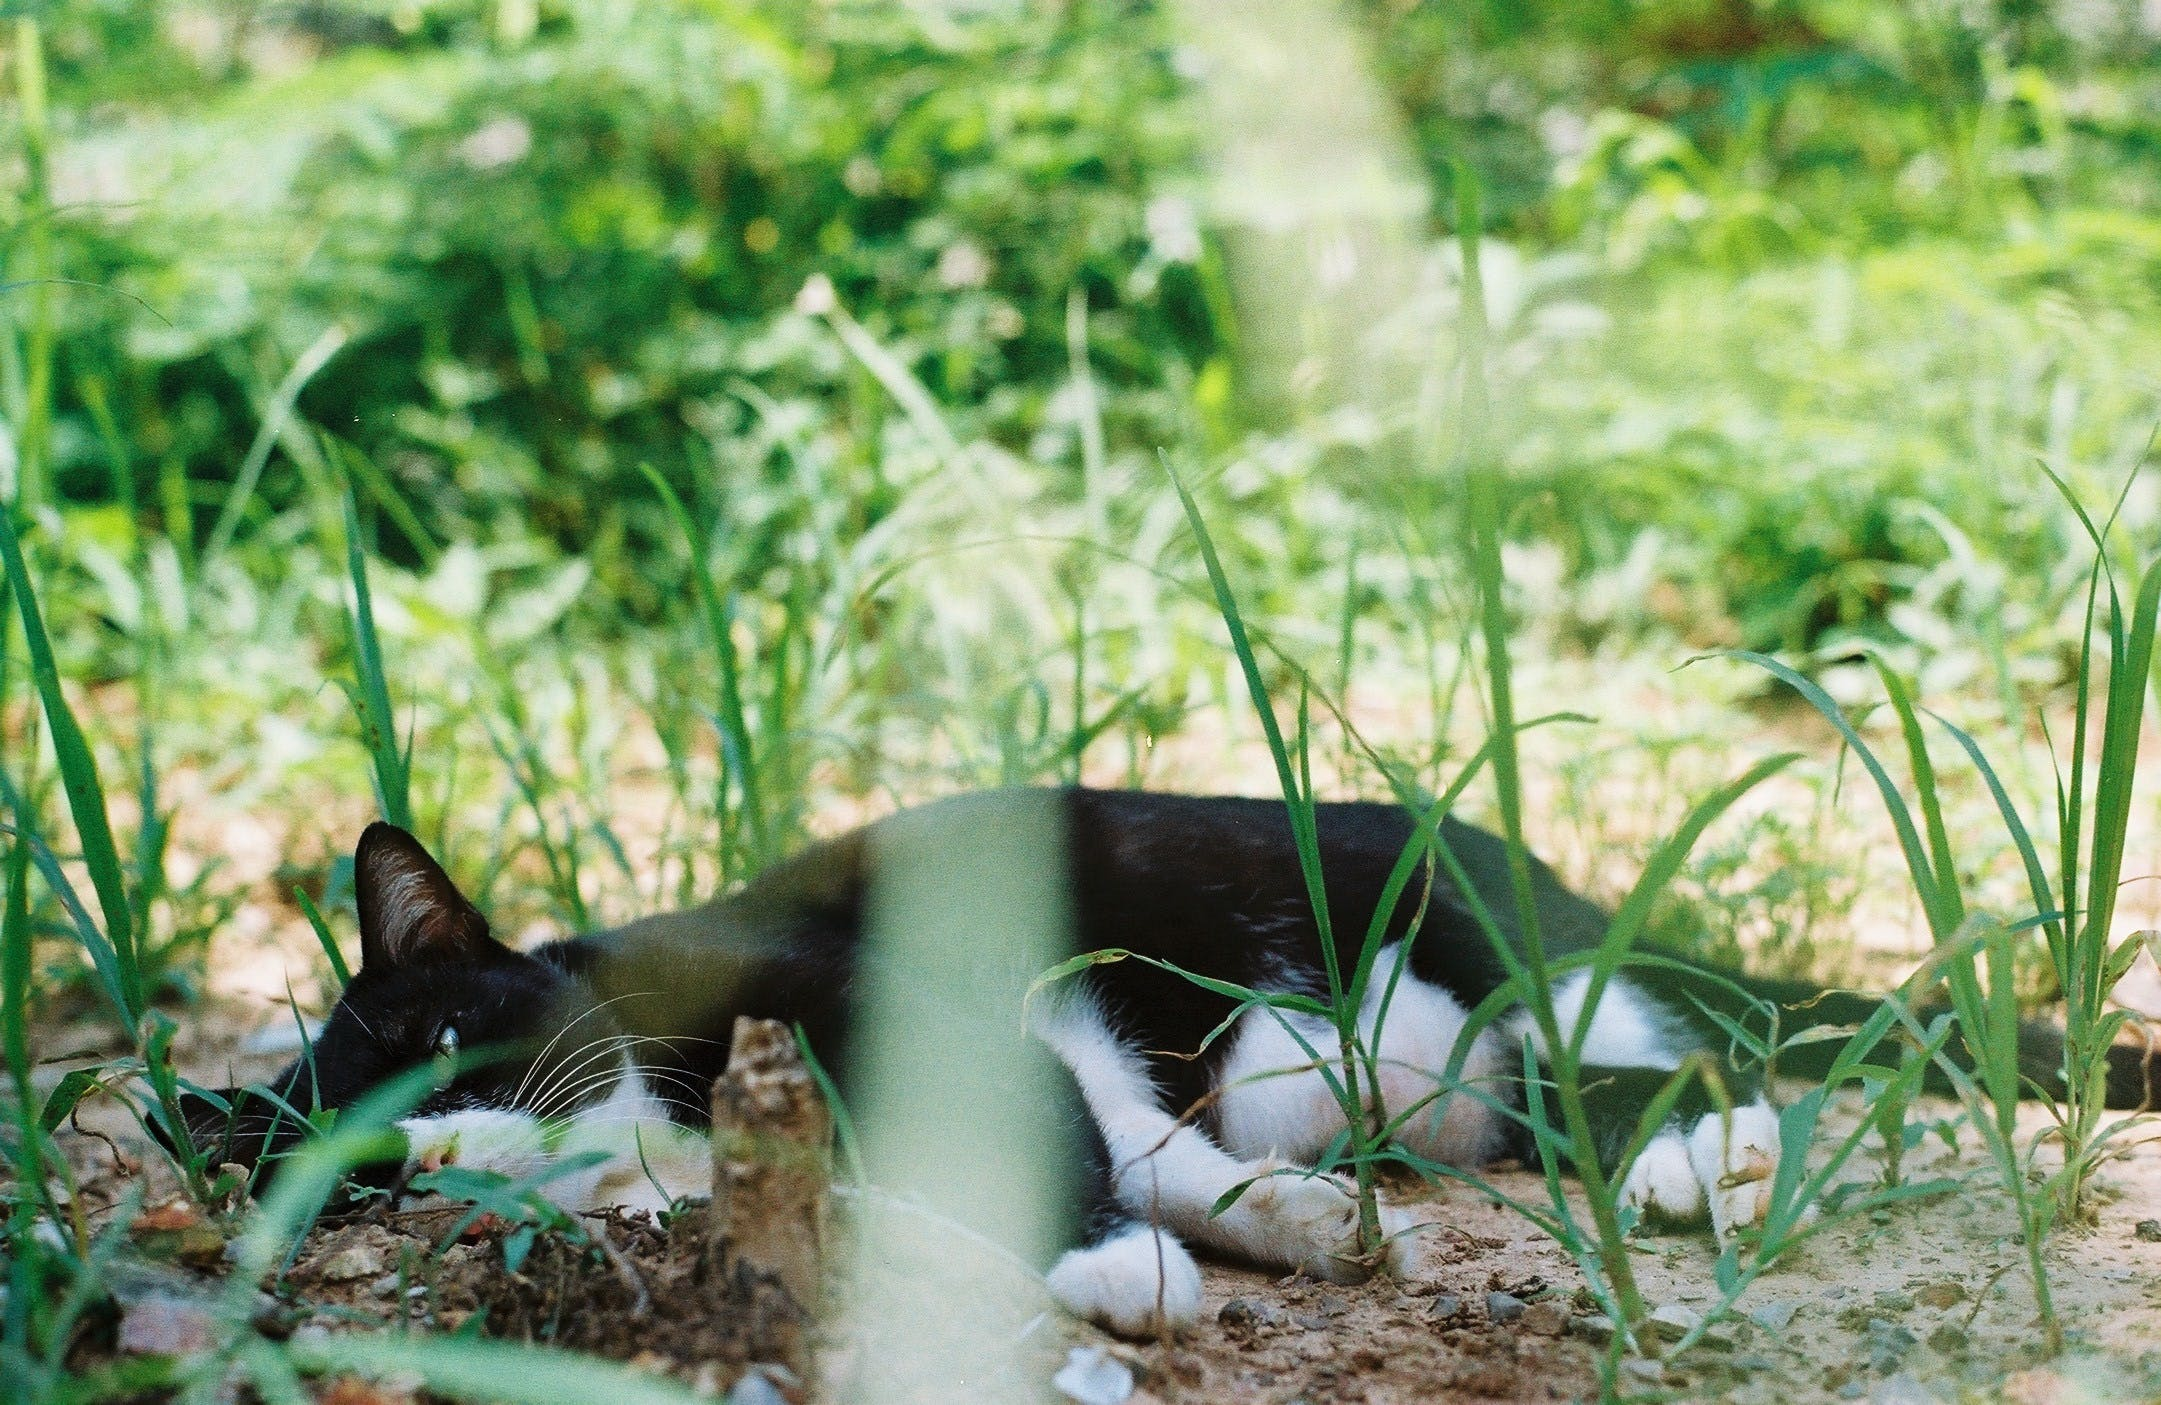 Free stock photo of #cat #chubby #film #filmcamera #iusefilm